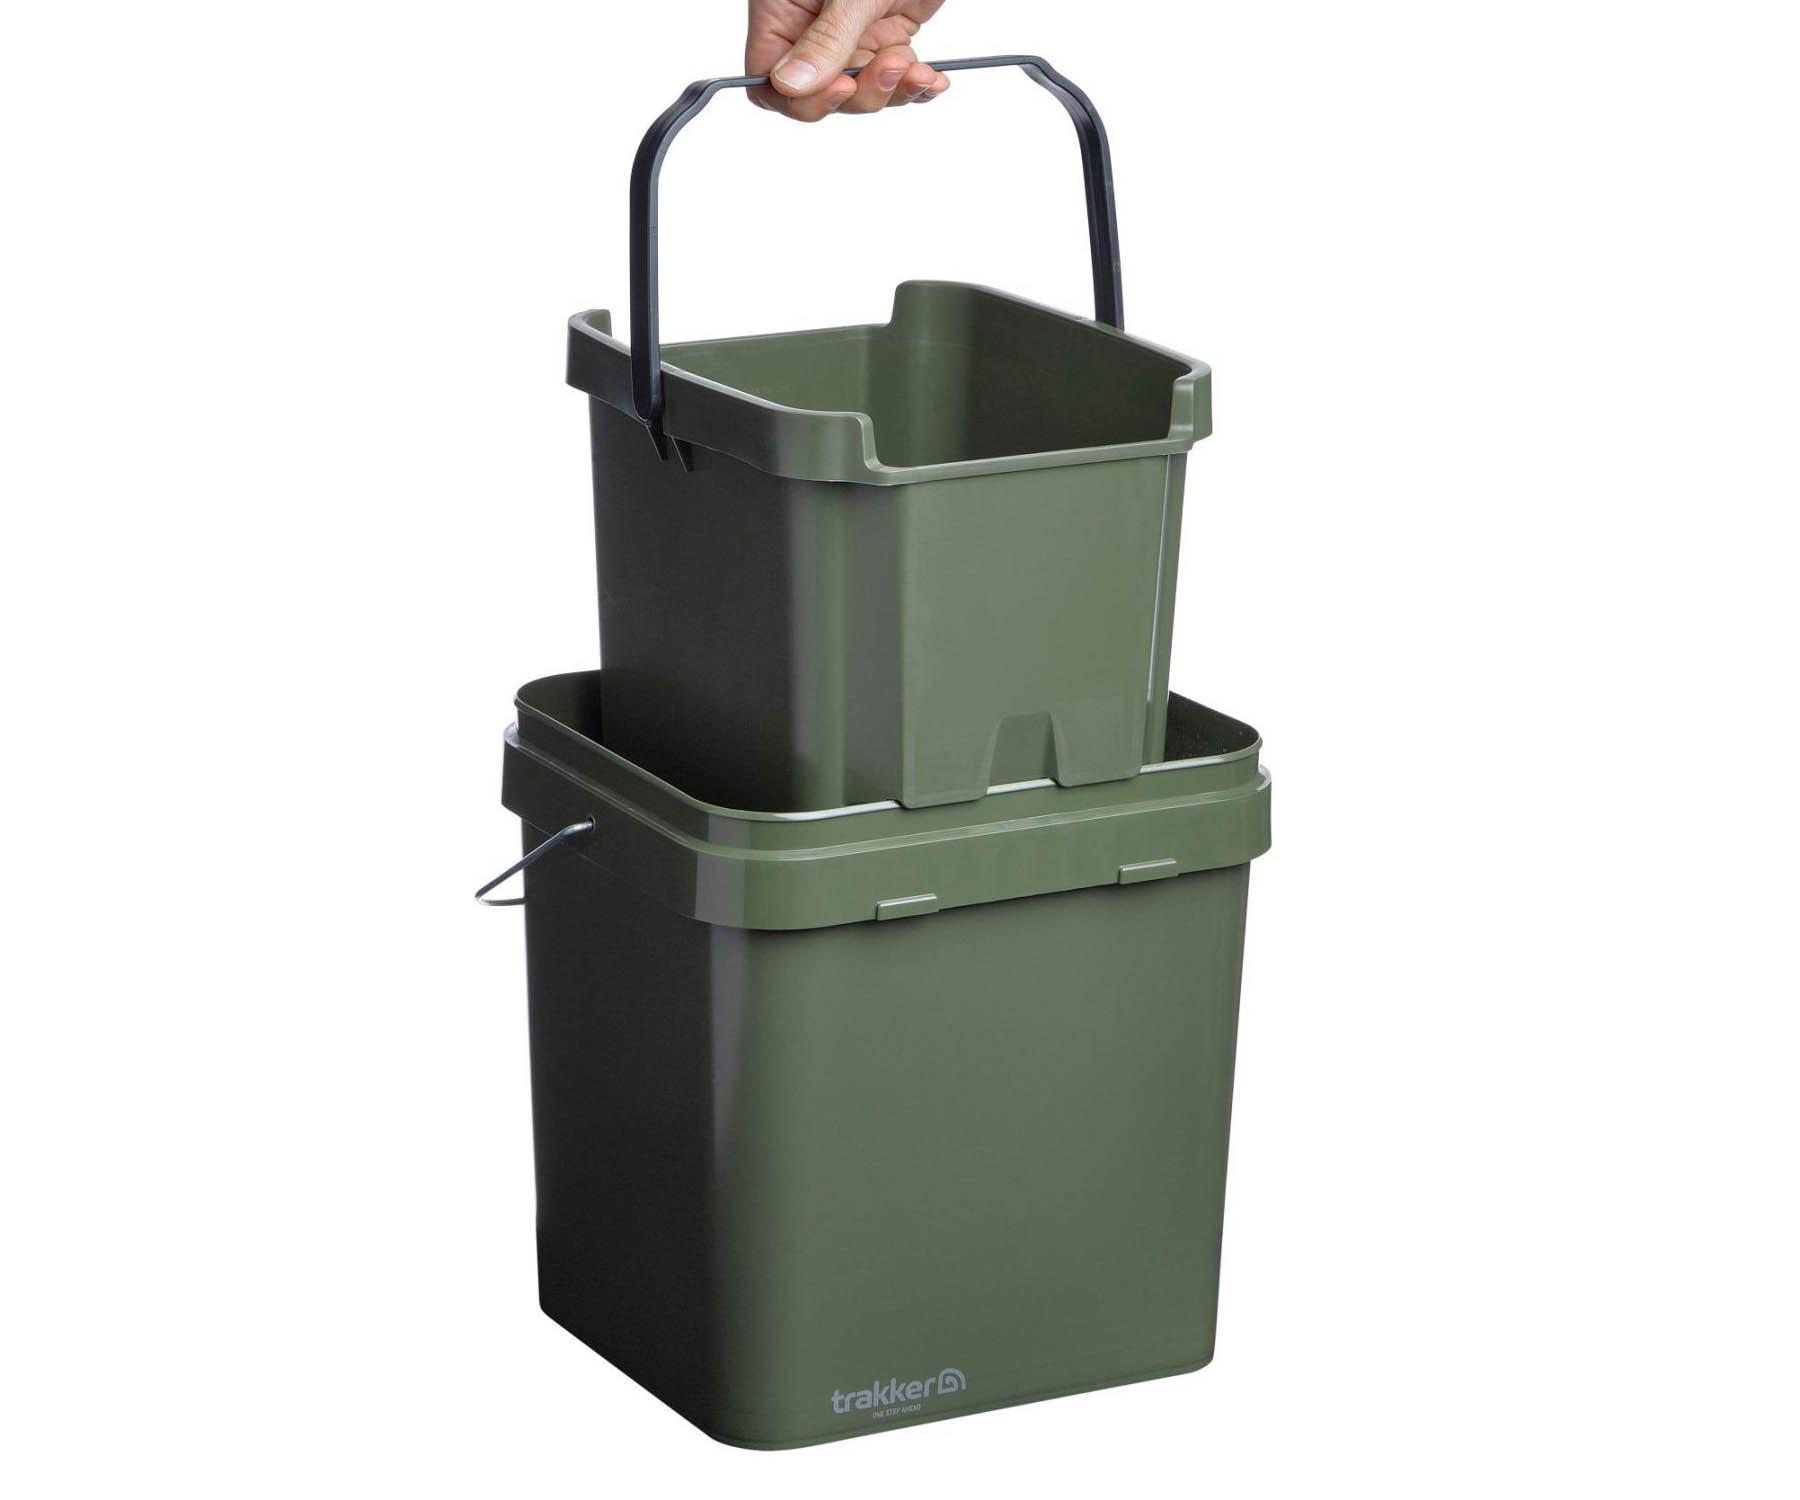 Ведро для фильтрации прикормки Trakker Pureflo Bait Filter System